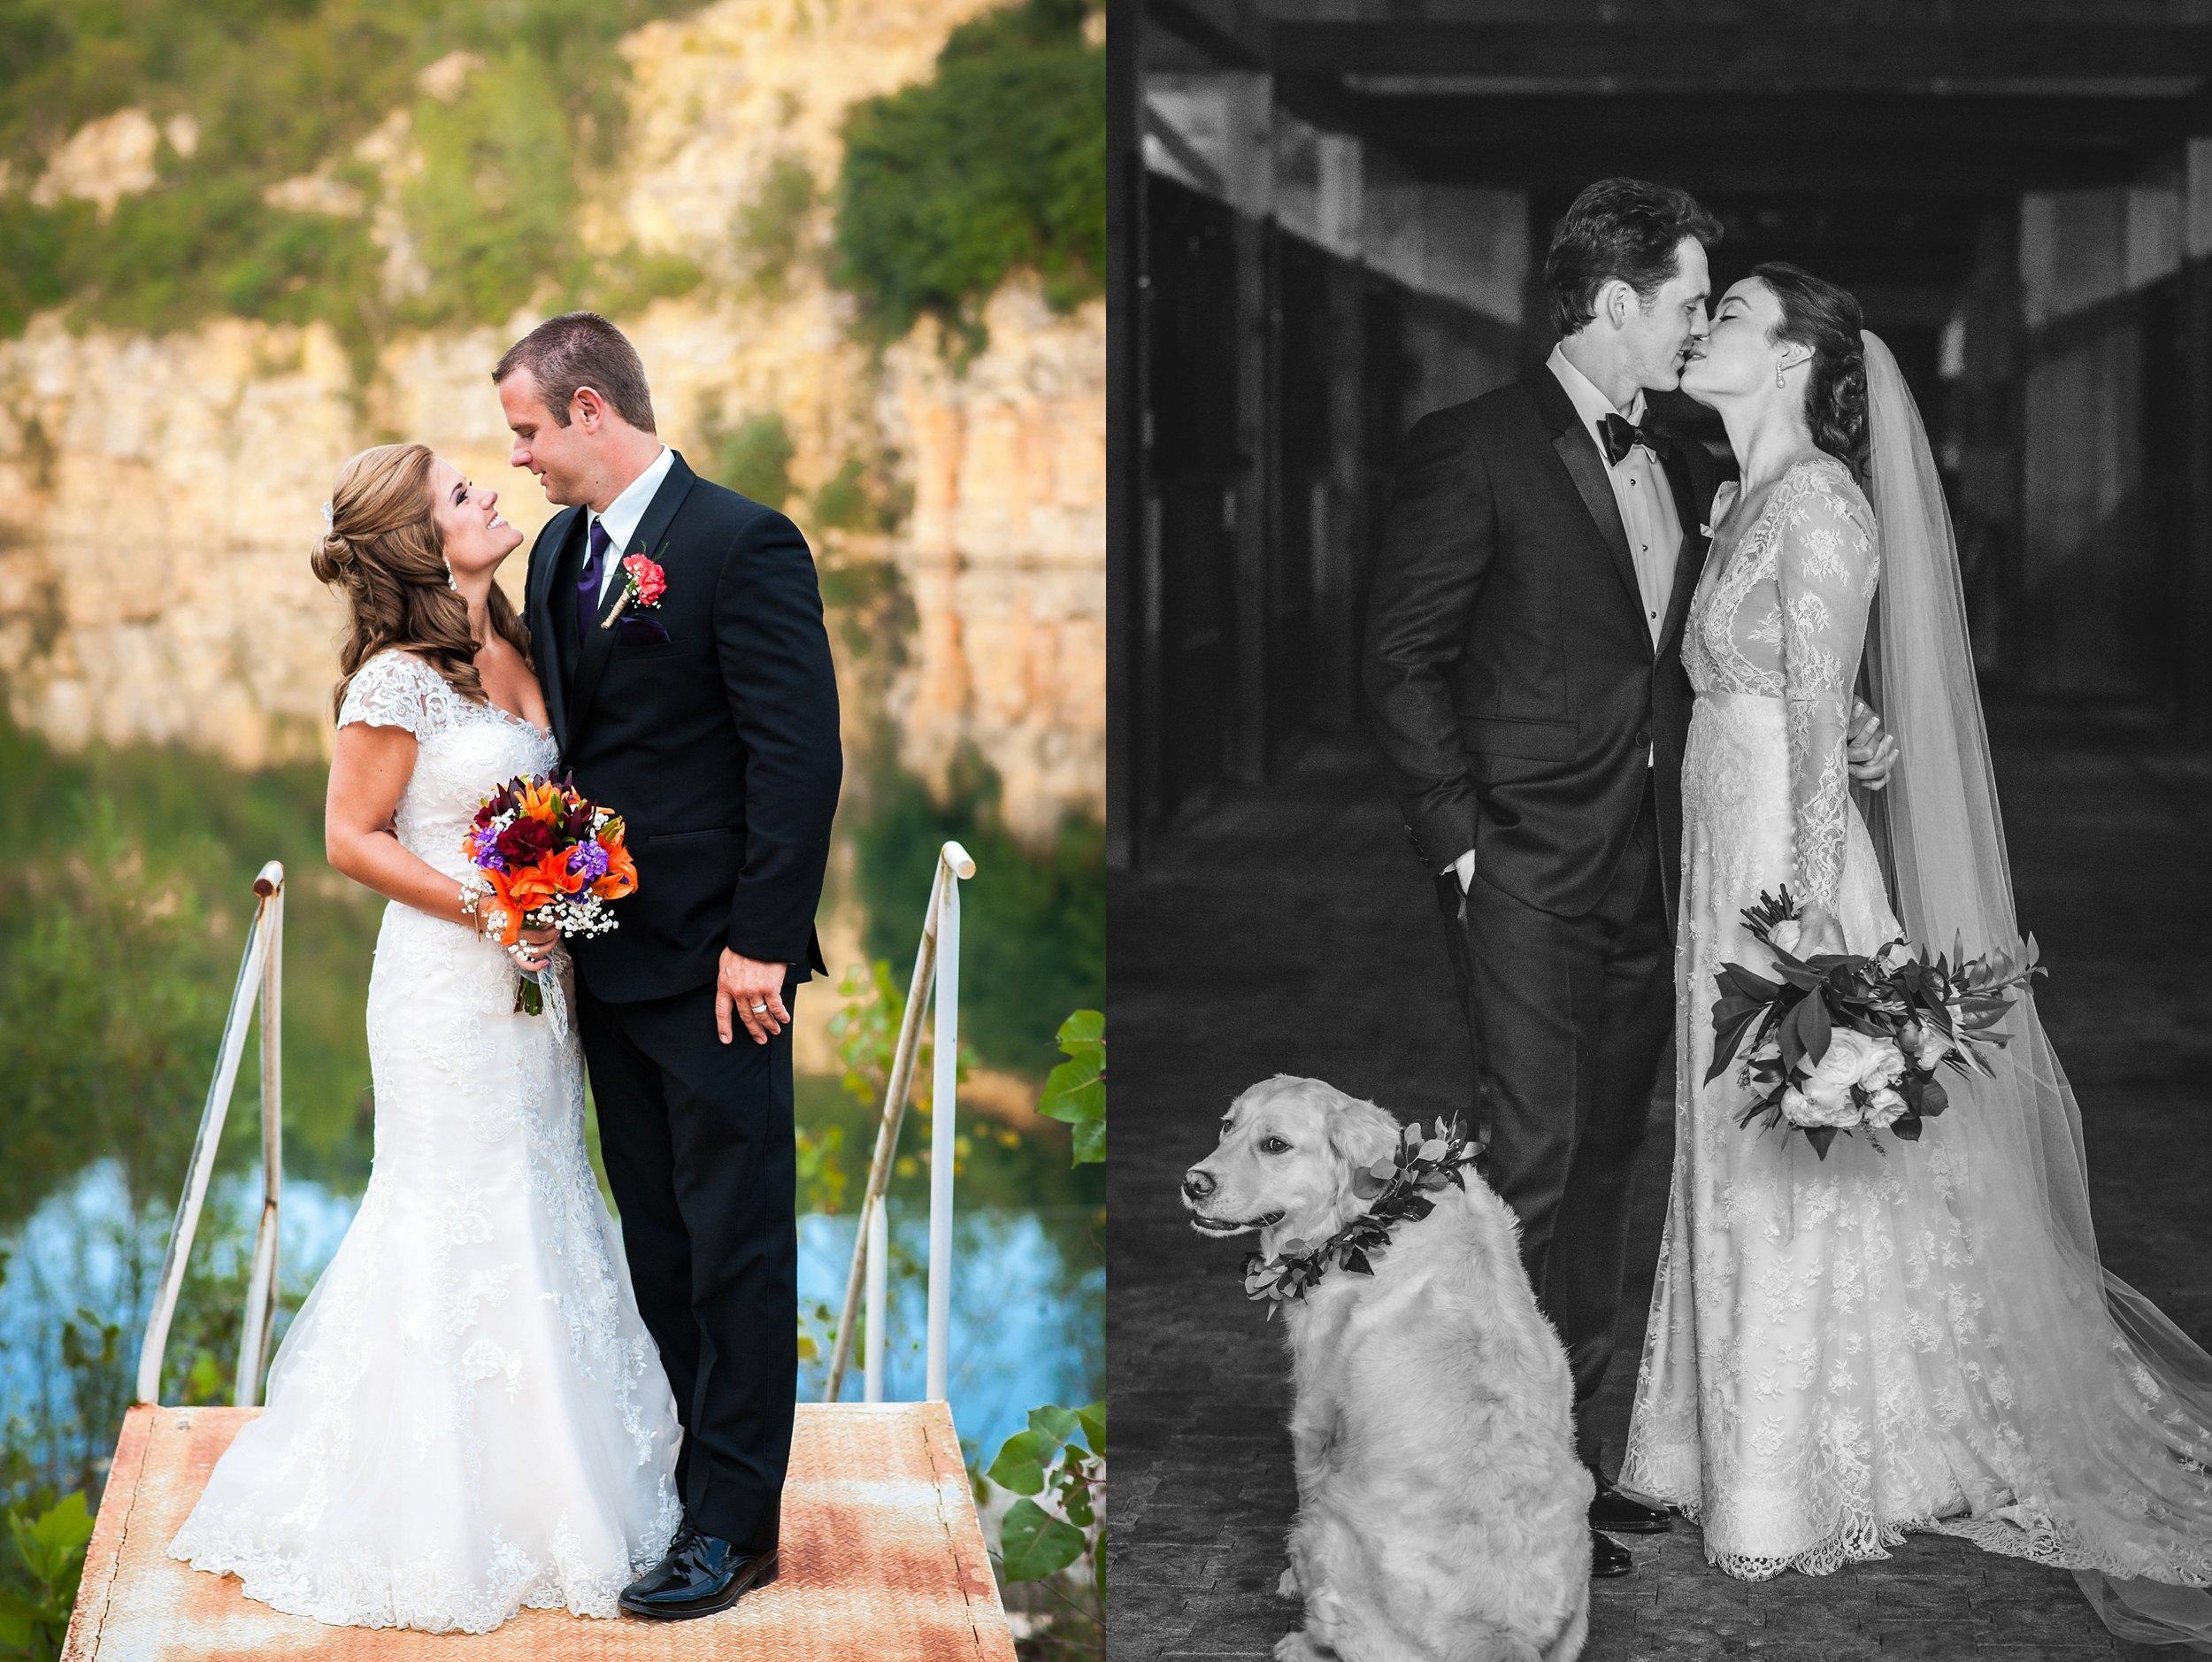 central_illinois_wedding_photographer_0201.jpg